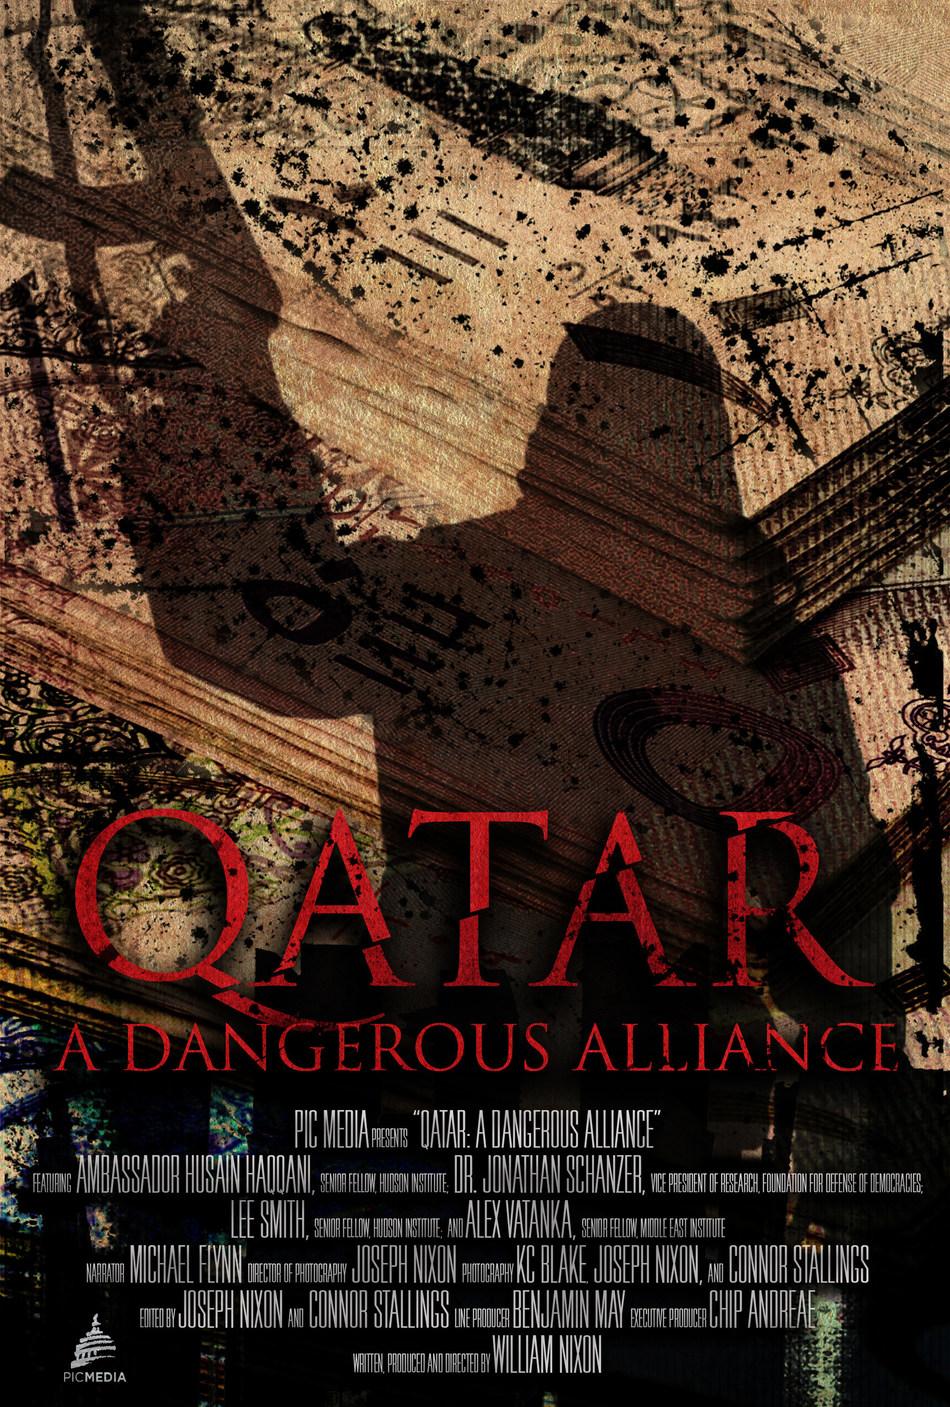 Qatar: A Dangerous Alliance